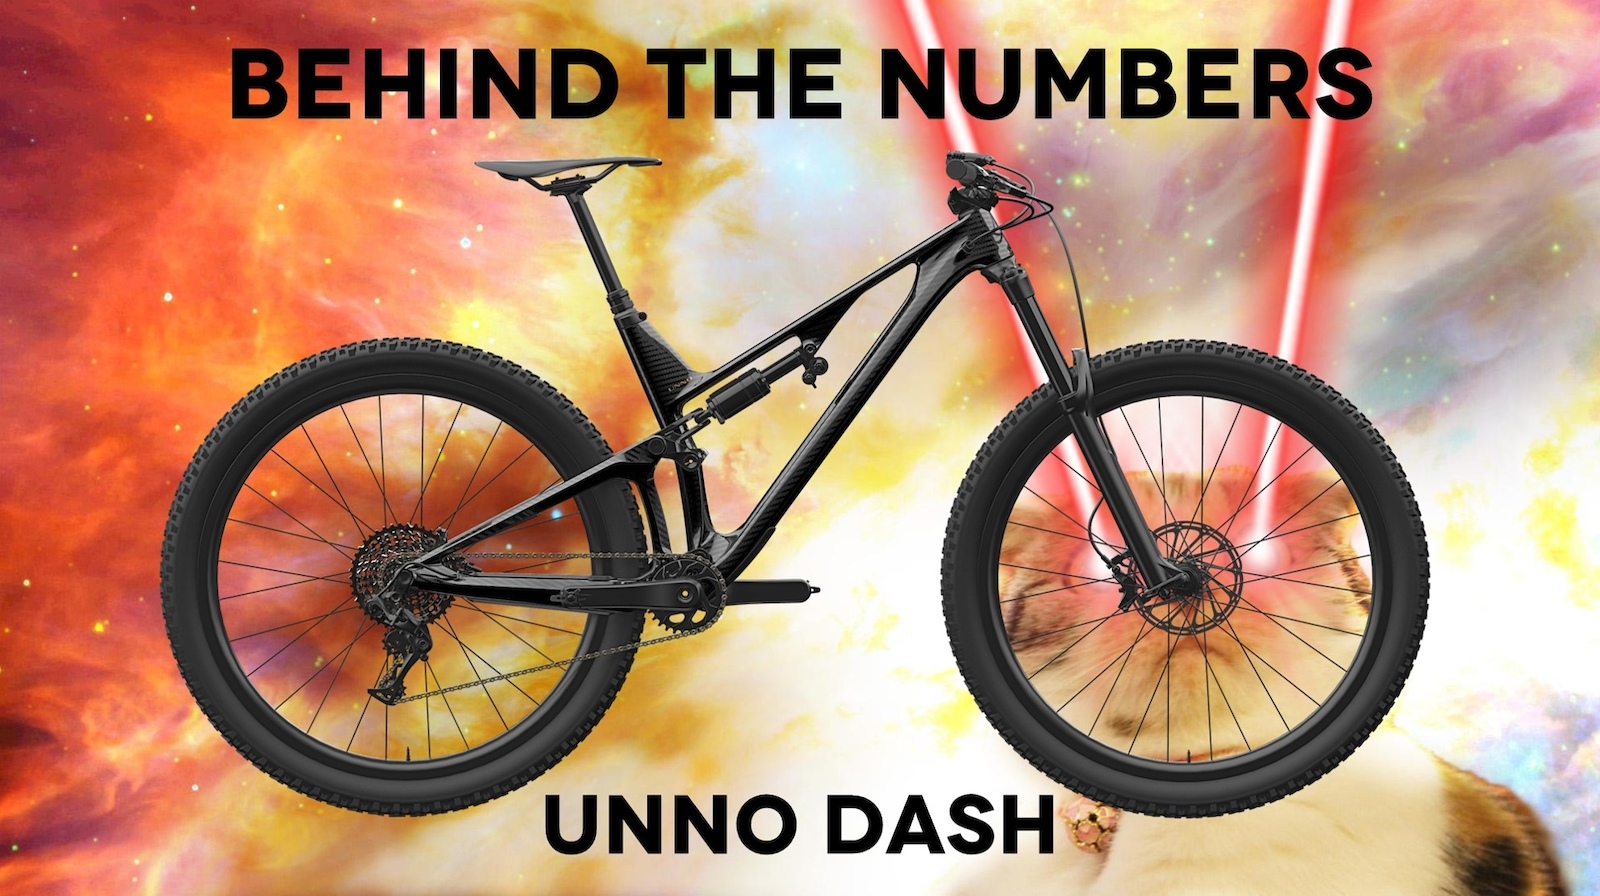 Behind the Numbers Unno Dash